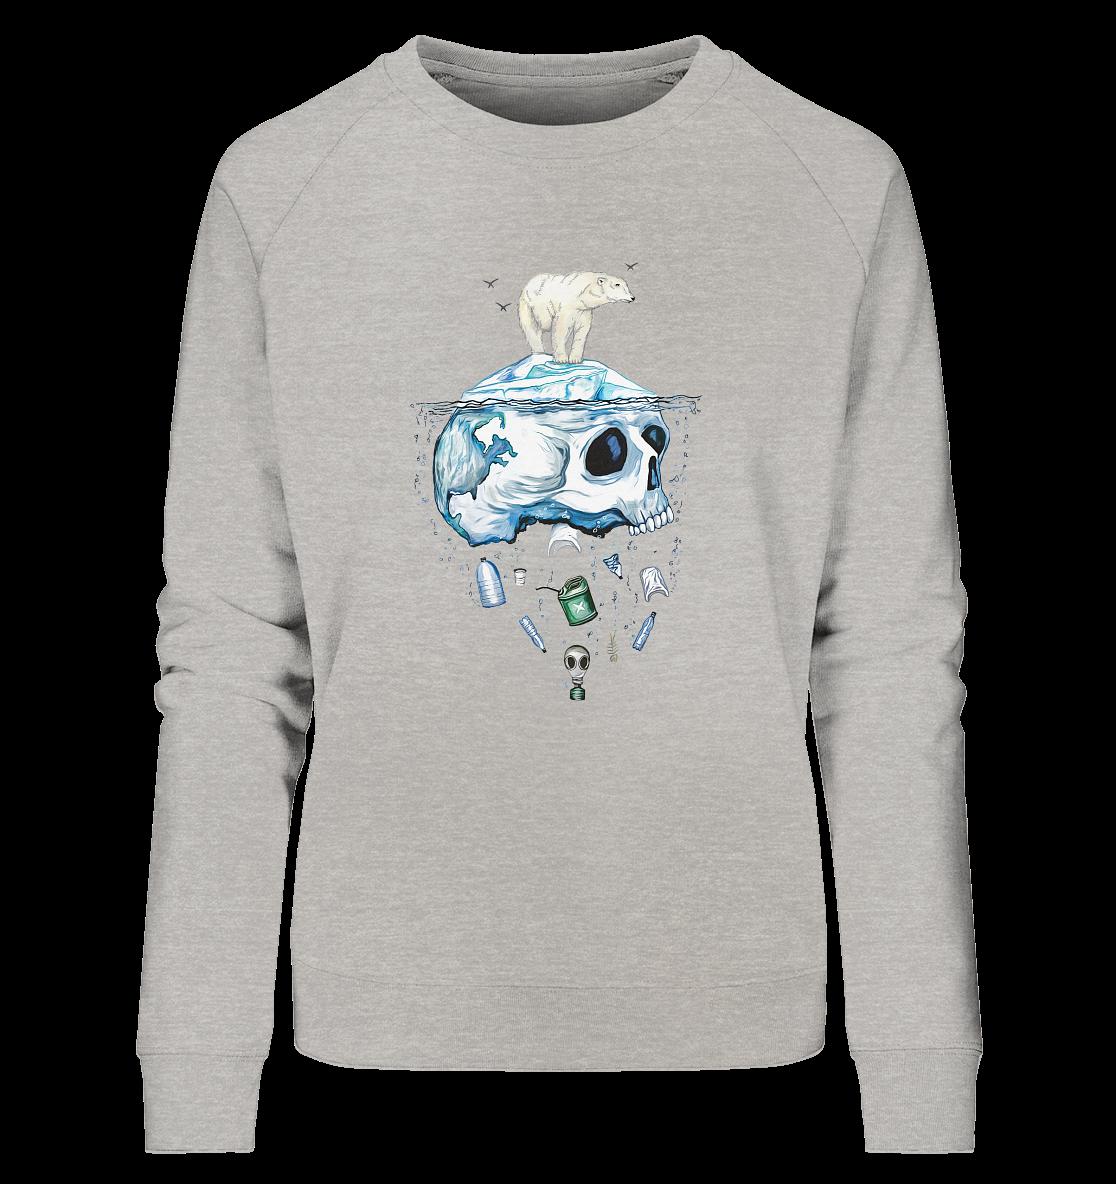 front-ladies-organic-sweatshirt-c2c1c0-1116x.png